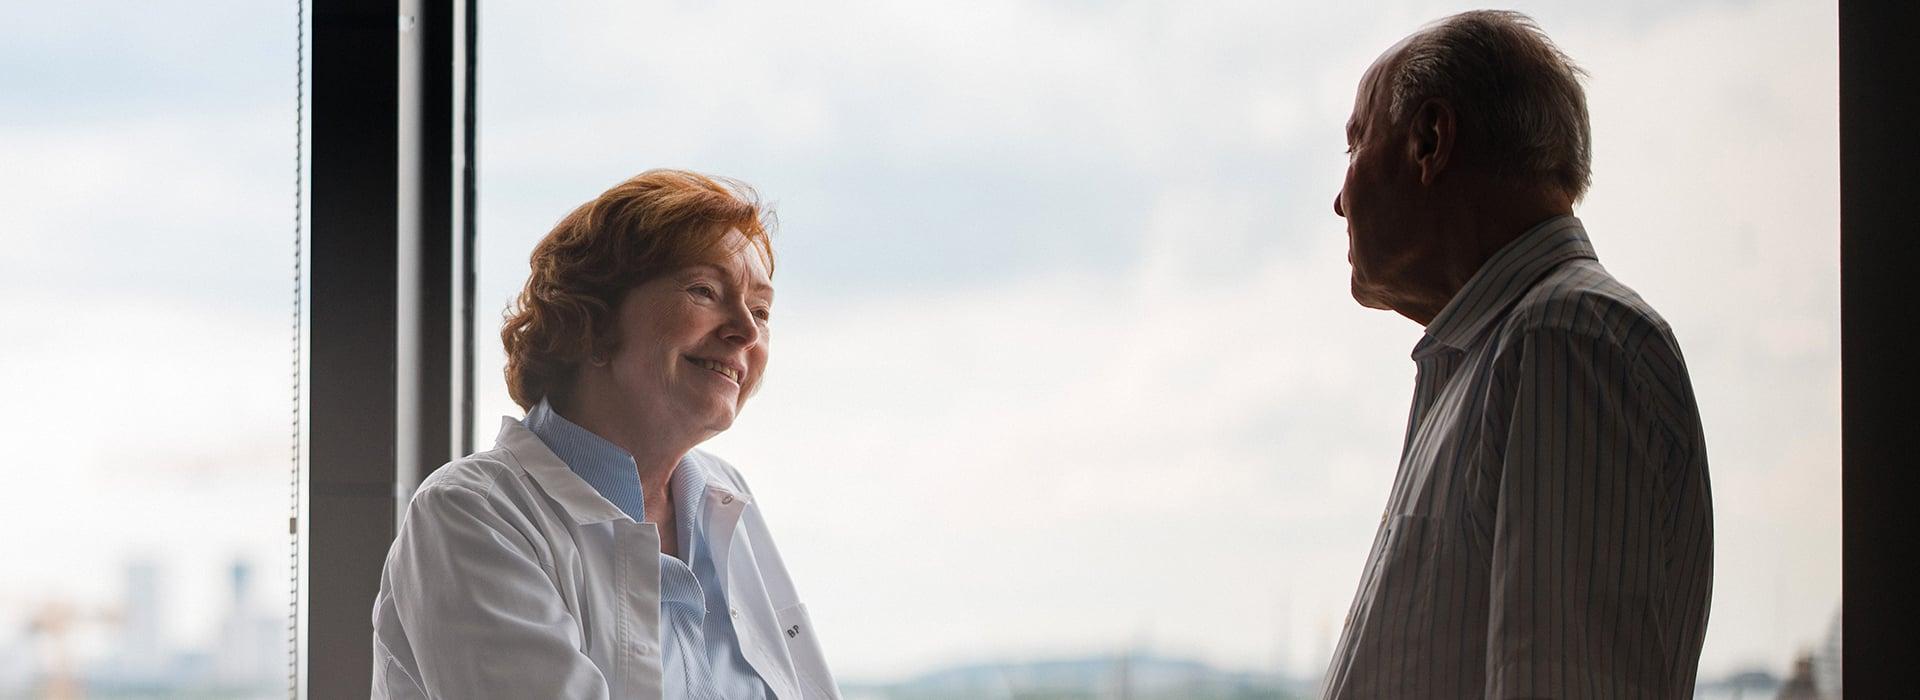 Dr. Kirsten Böhm - Private Hautarztpraxis